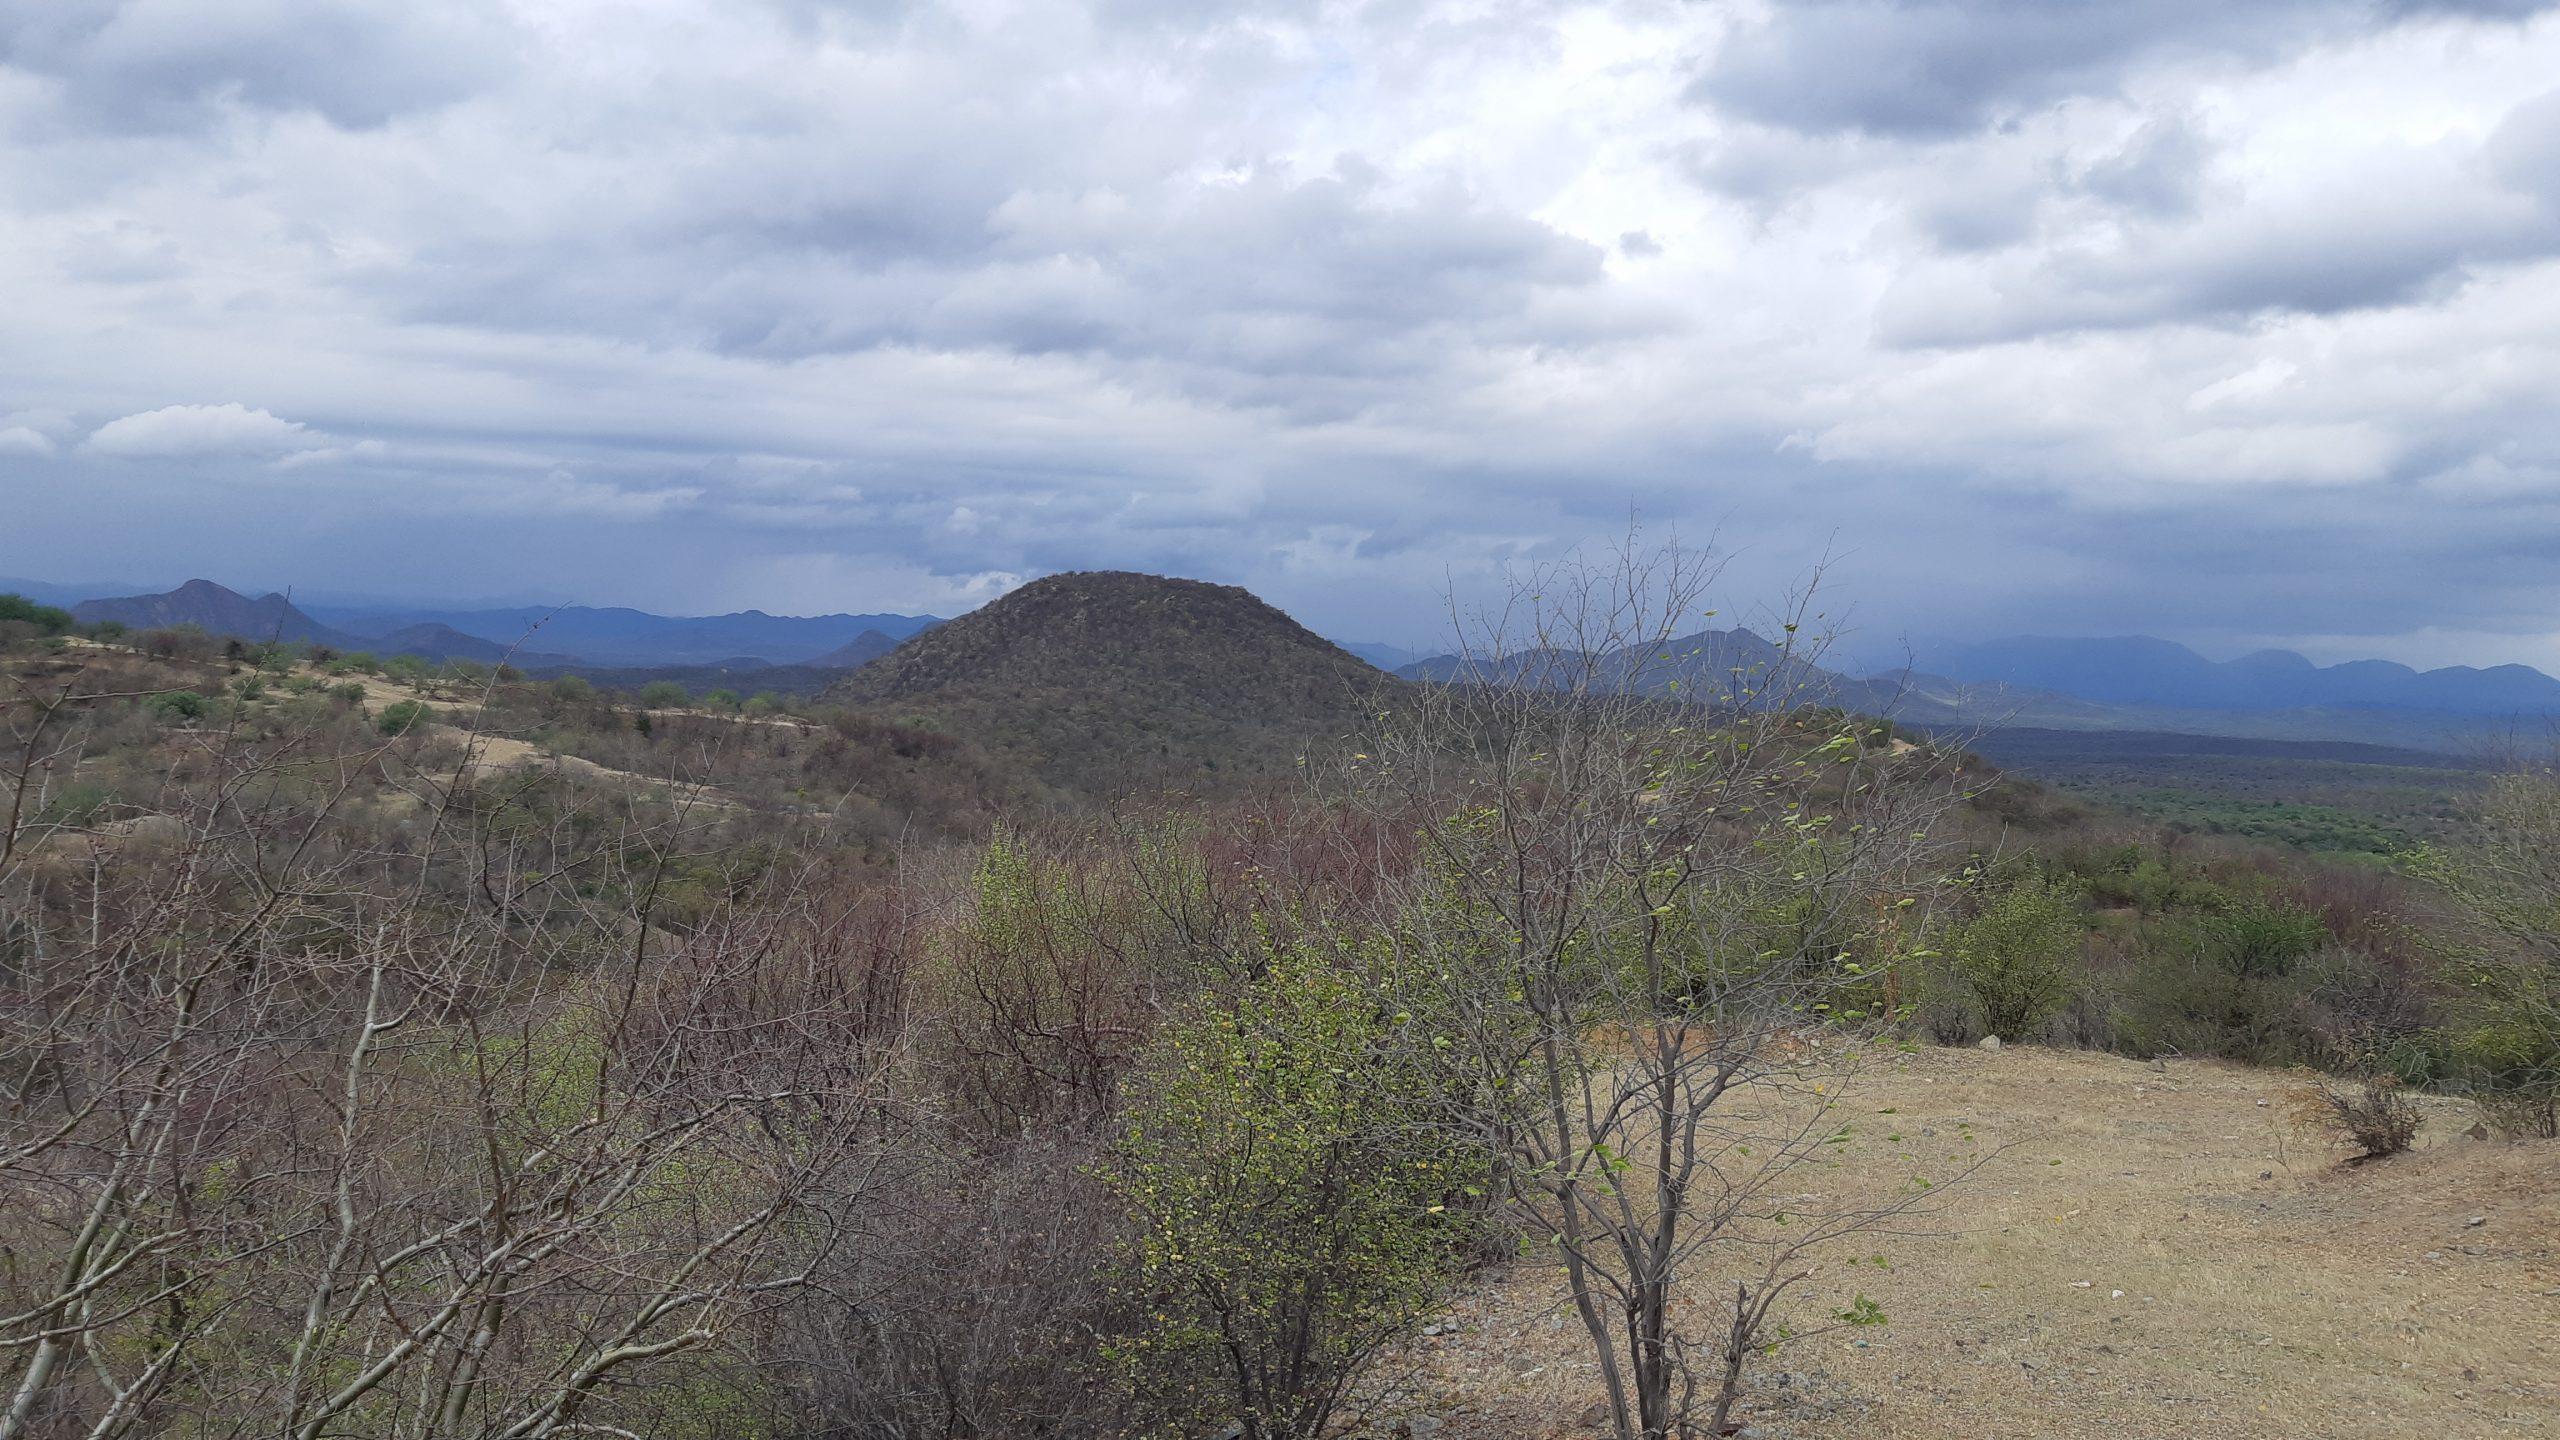 Pilar view from 4 Trench toward Main Zone at Pilar